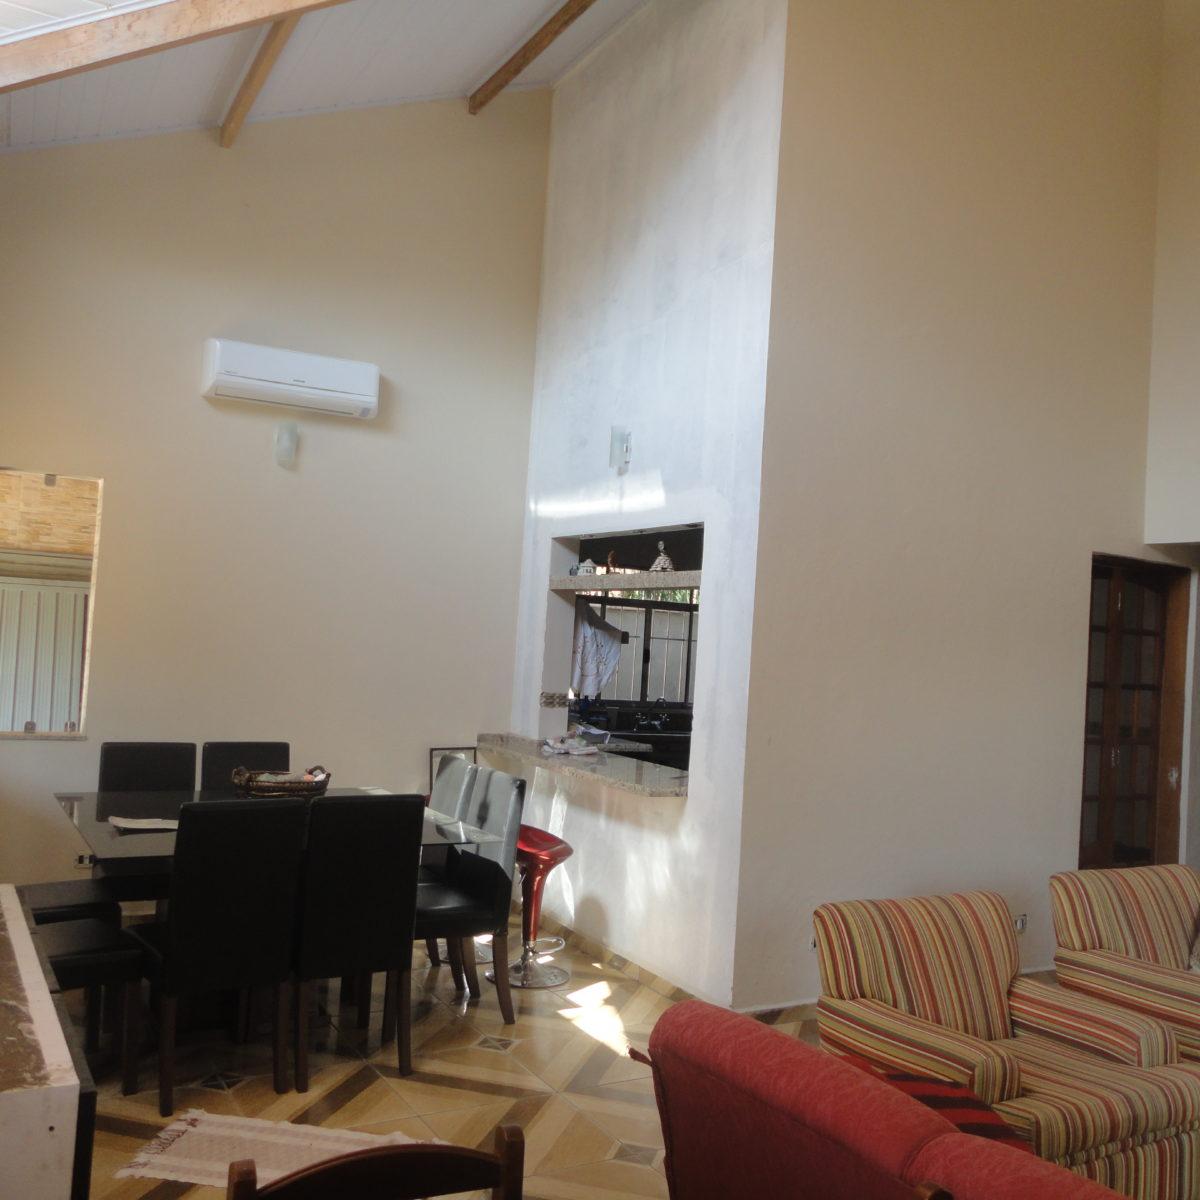 Ref.: R$350.000,00 Casa térrea 3 dorm (81264)